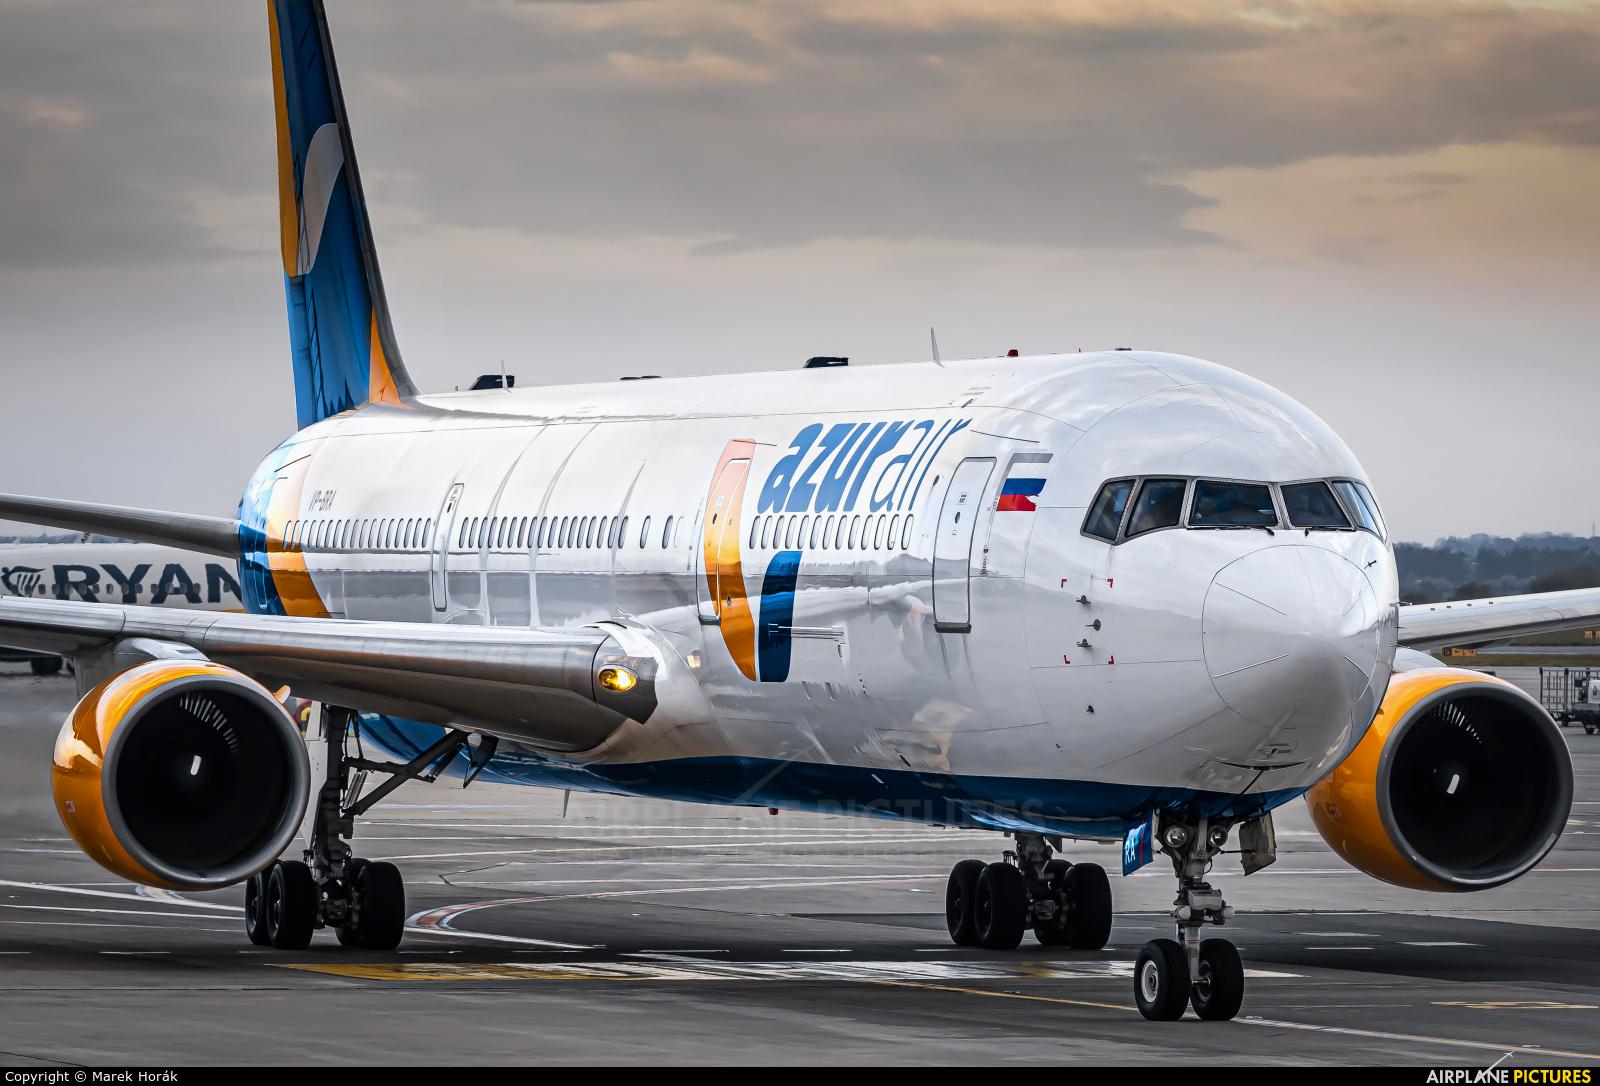 AzurAir VP-BRA aircraft at Prague - Václav Havel